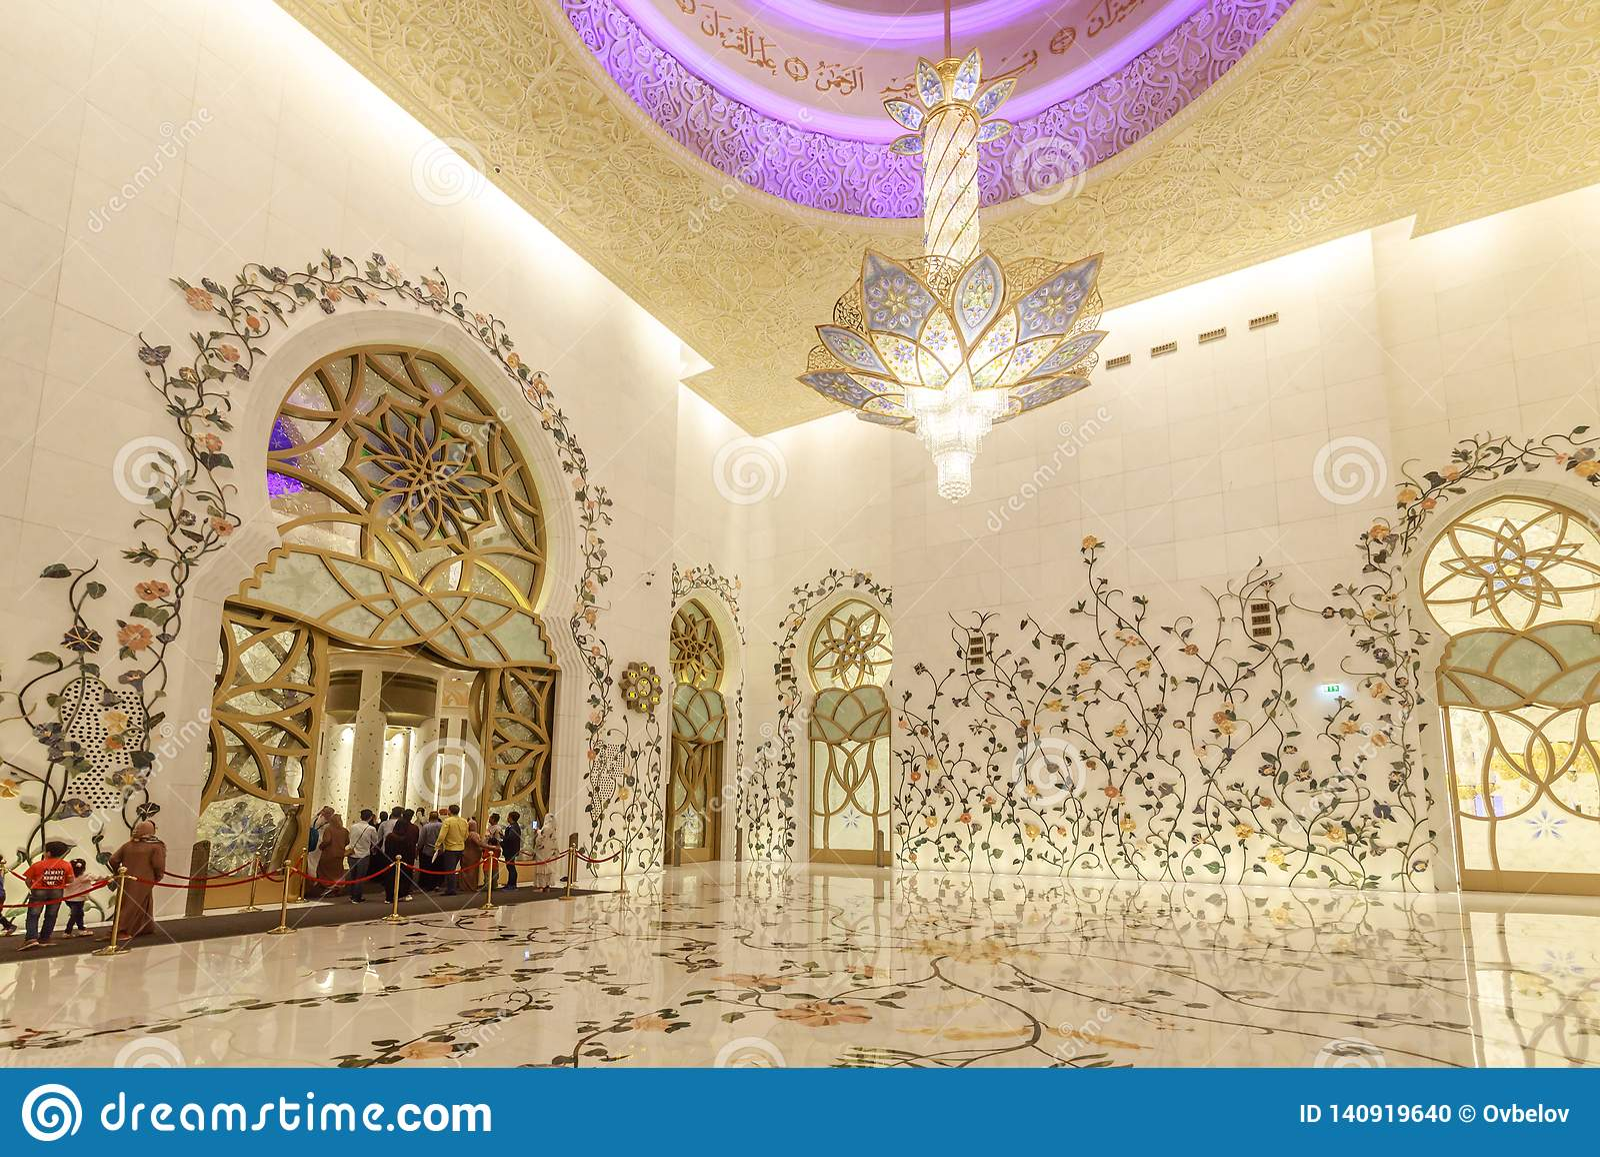 Den Sheikh Zayed Grand Mosque inre dekoreras rikt med marmorerar och blom- mosaiker